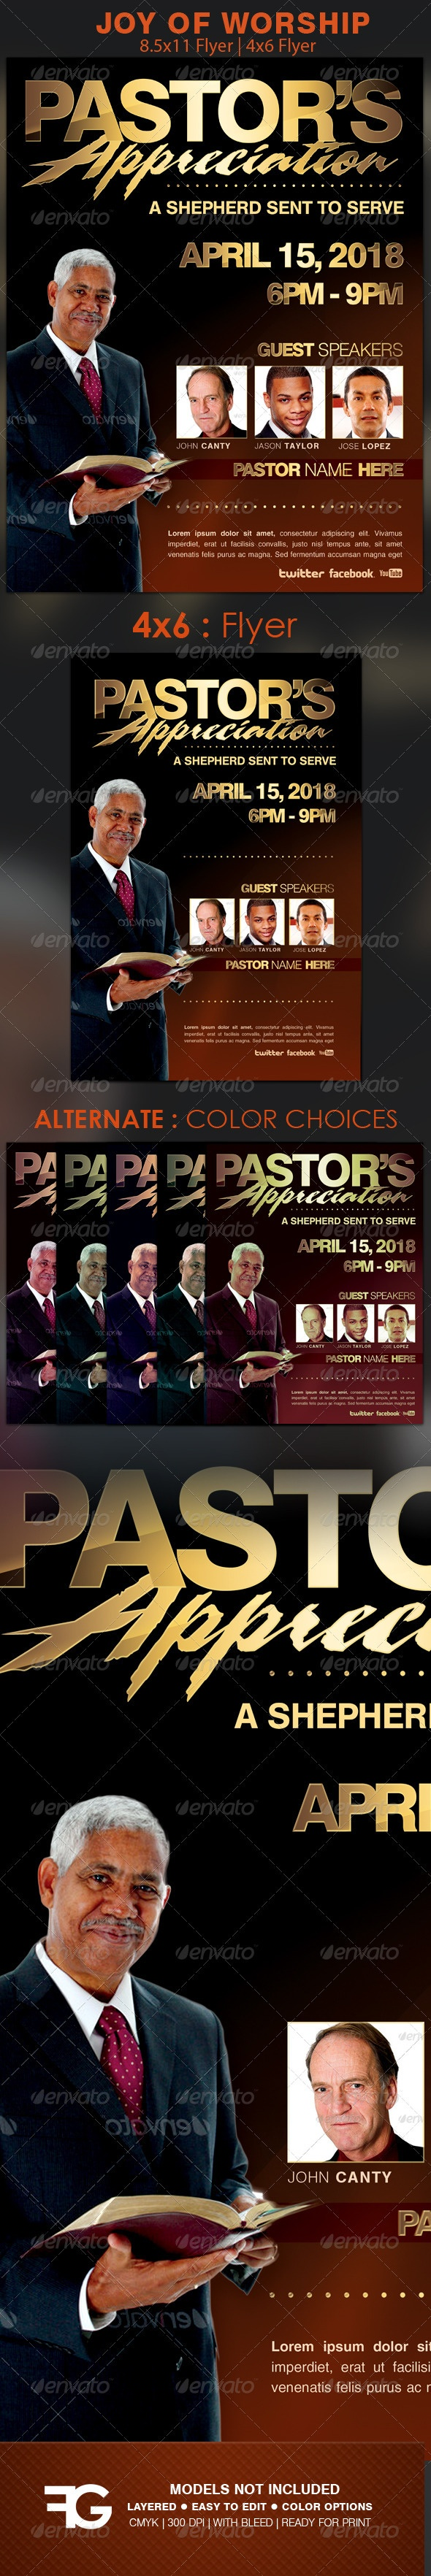 Pastors Appreciation Church Flyer Template 14 best